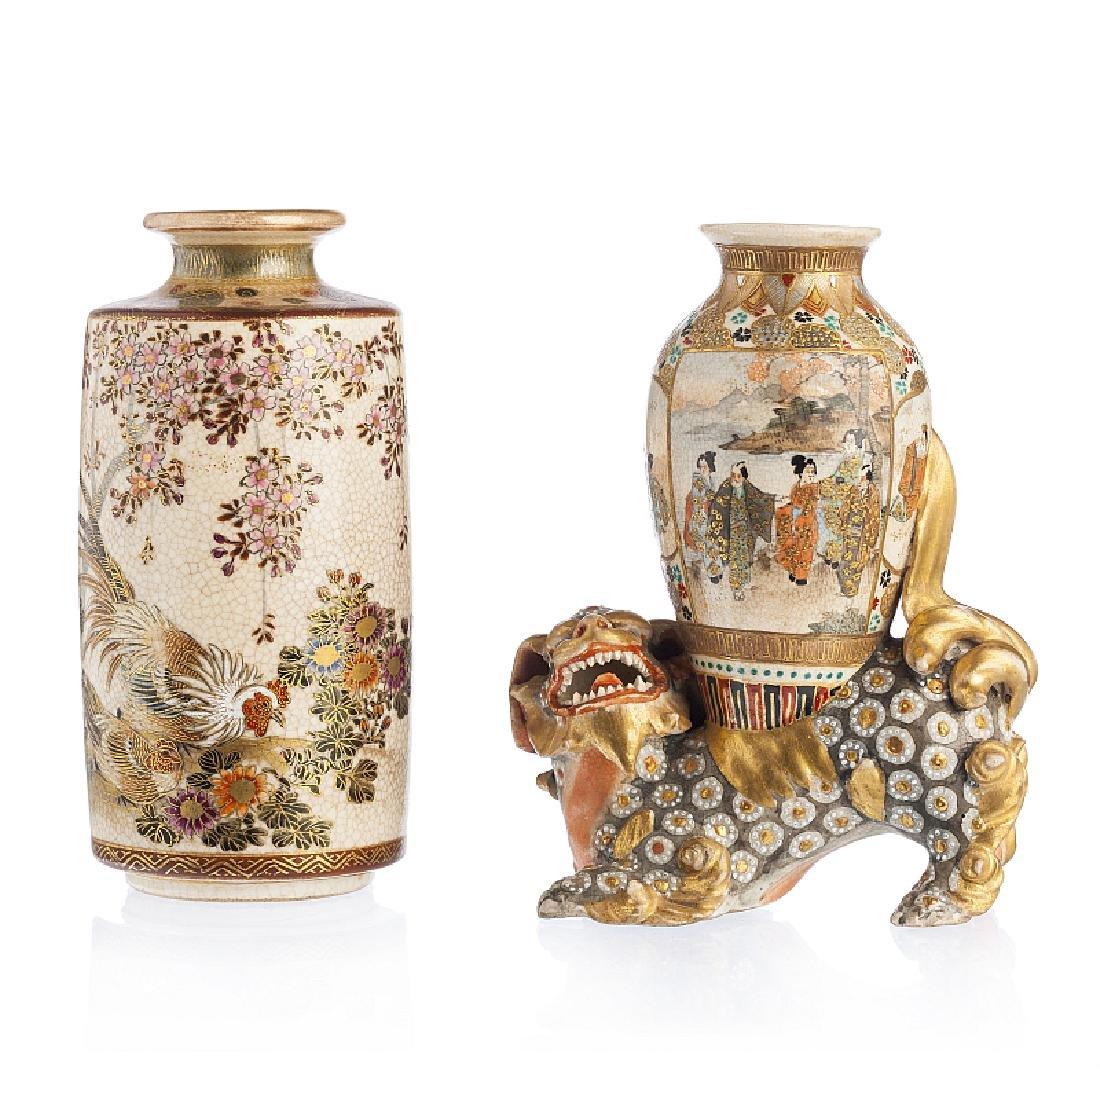 Two vases in Satsuma ceramic